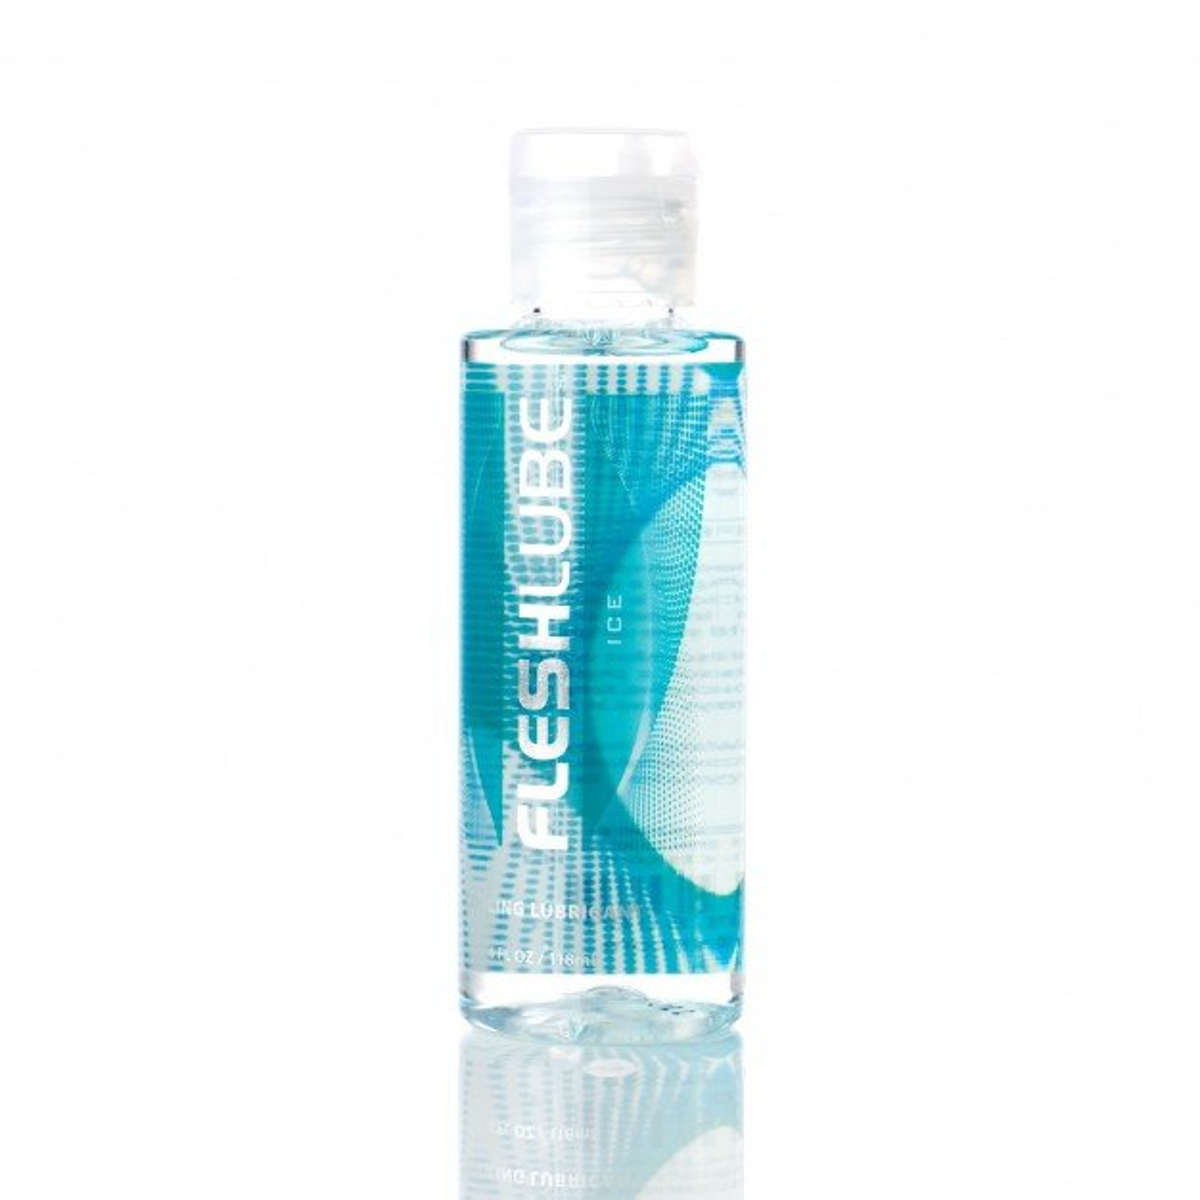 Fleshlight Fleshlube Ice 100 ml, lubrikant na vodní bázi